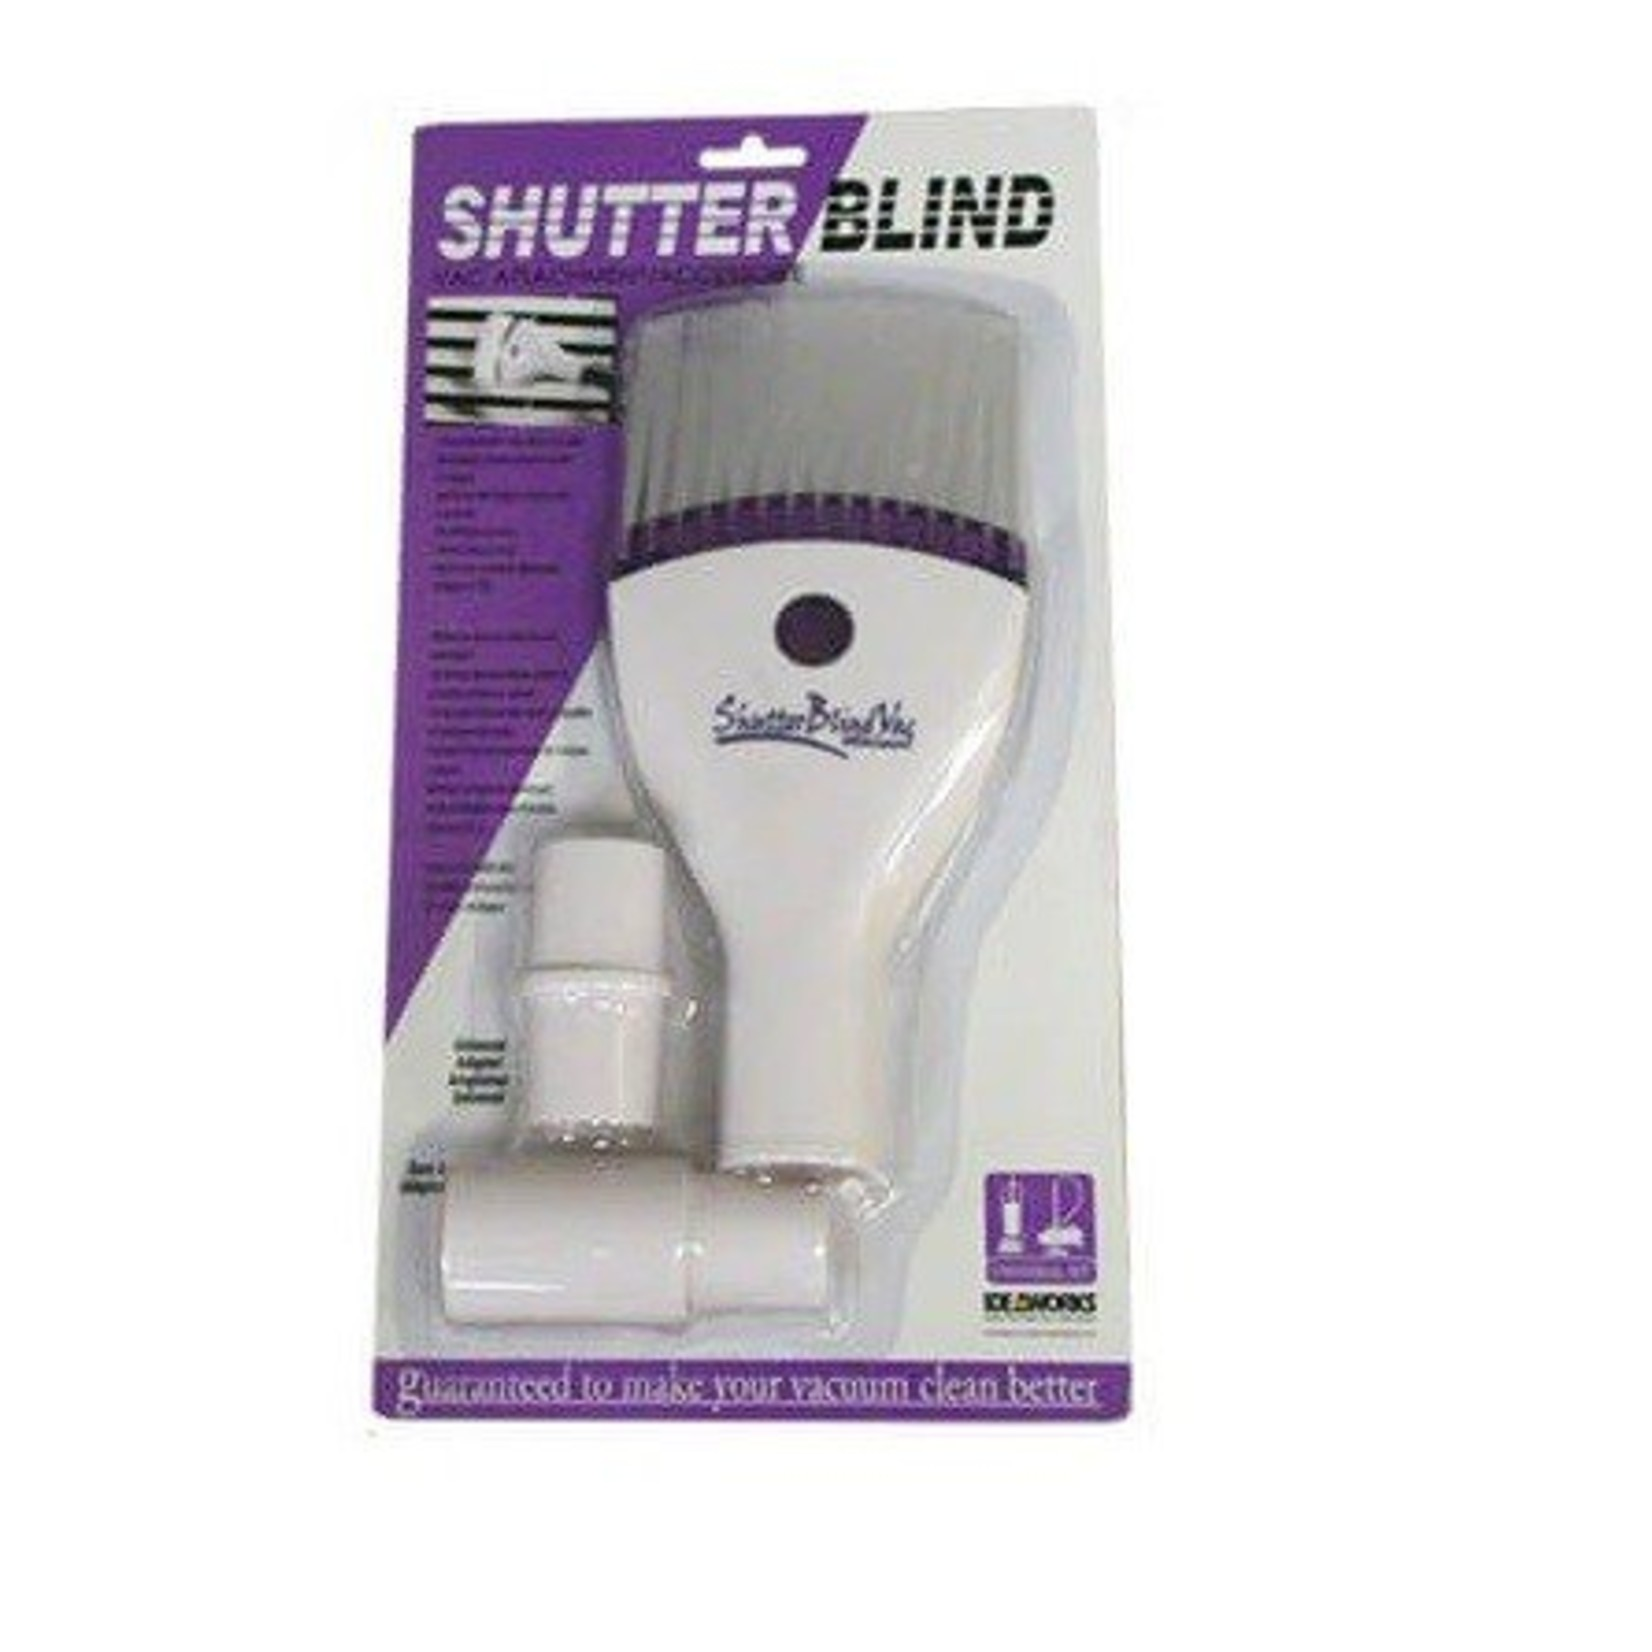 Central Vacuum Shutter Blind Attachment